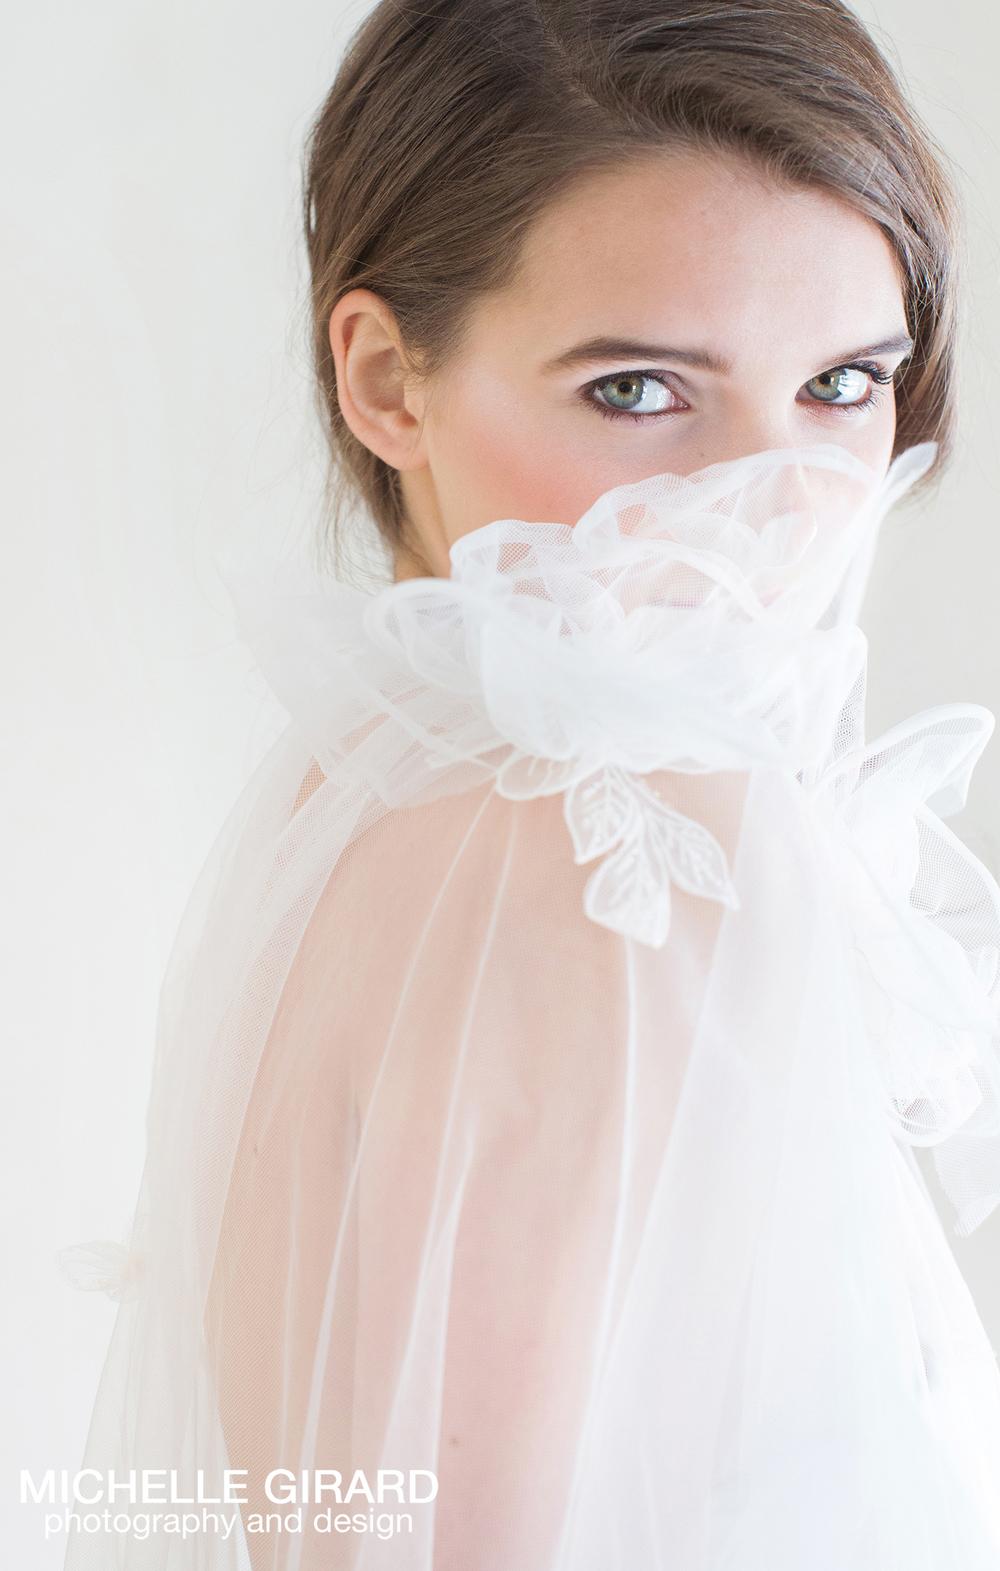 BeautyPhotography_Michelle GirardPhotography01.jpg